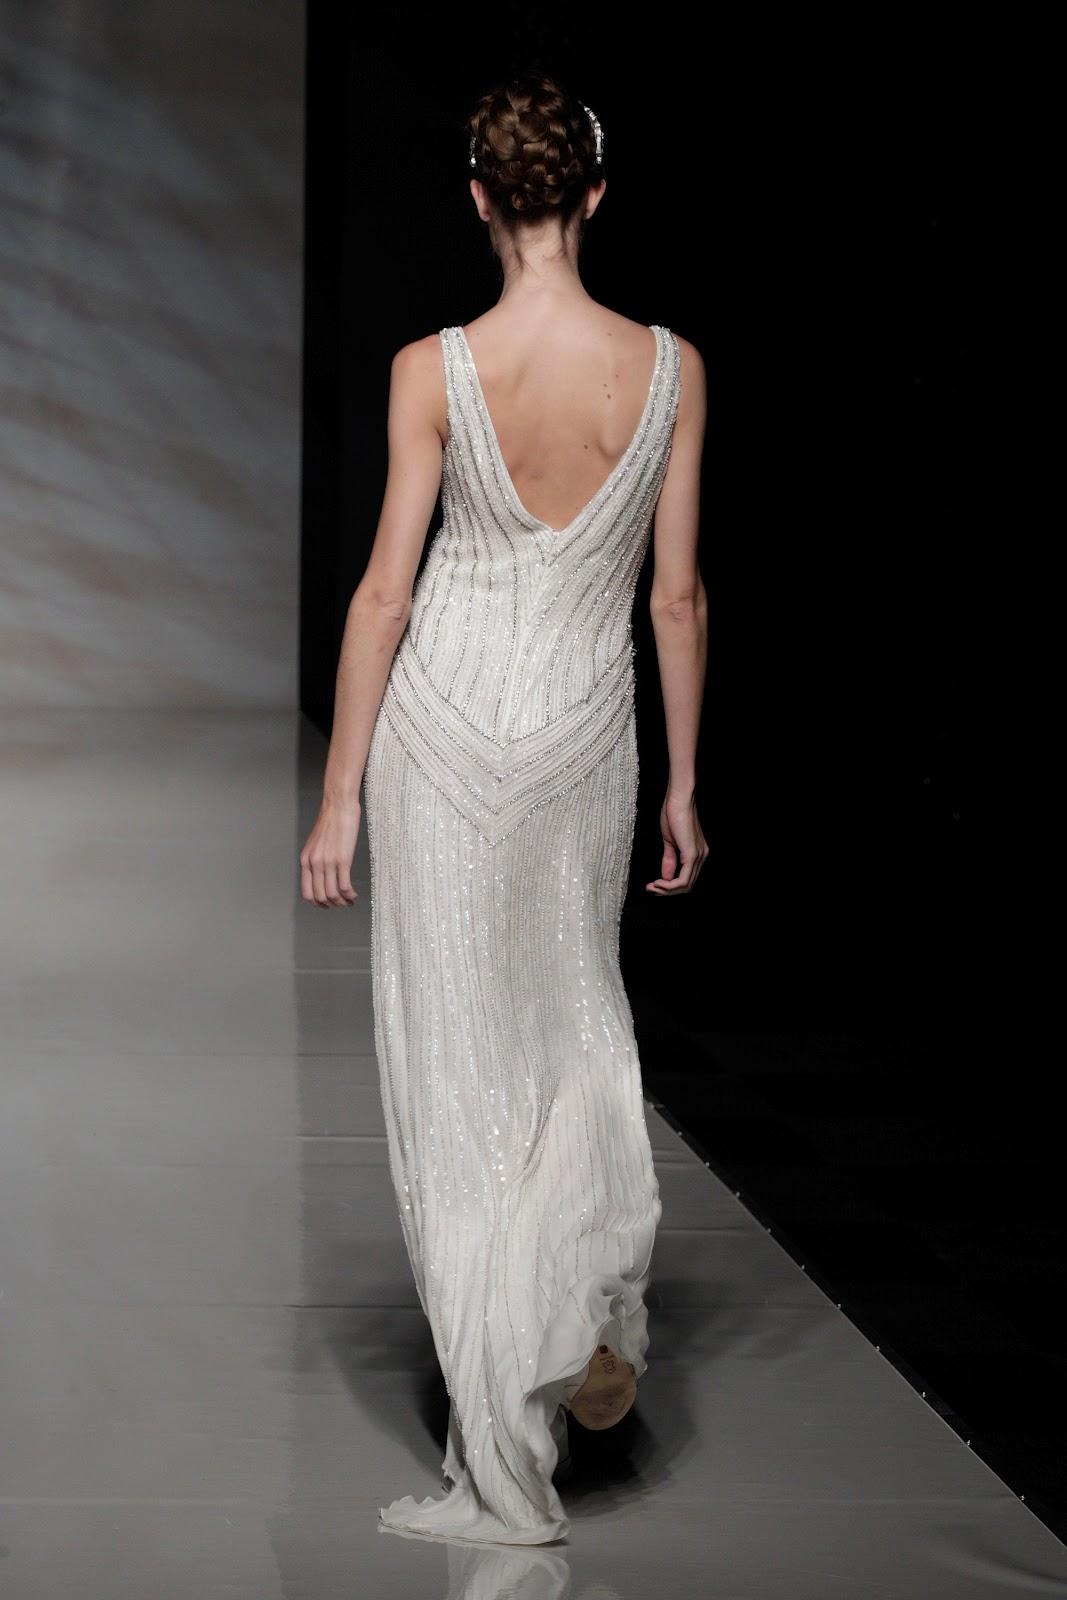 frumpy to funky: Bridal Fashion 2013 - Anoushka G\'s Around The World ...